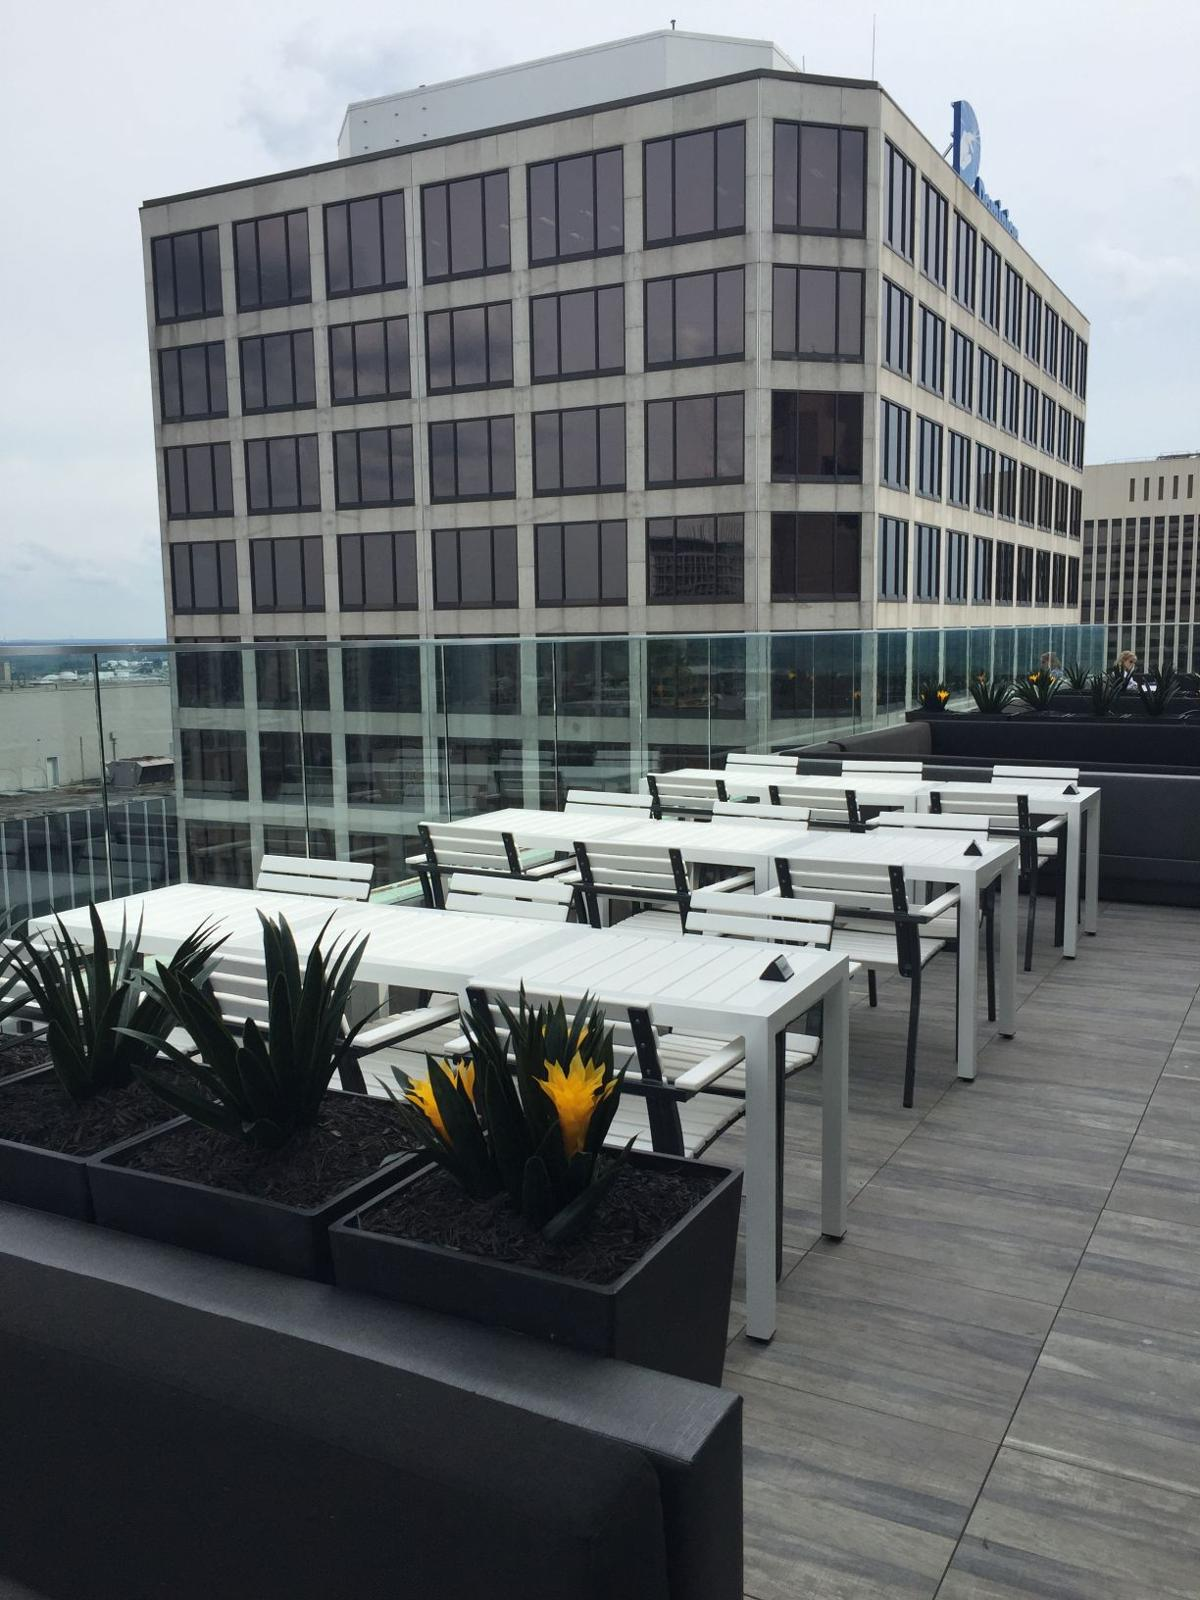 Rooftop bar guide: Richmond's latest hot spots | Entertainment |  richmond.com